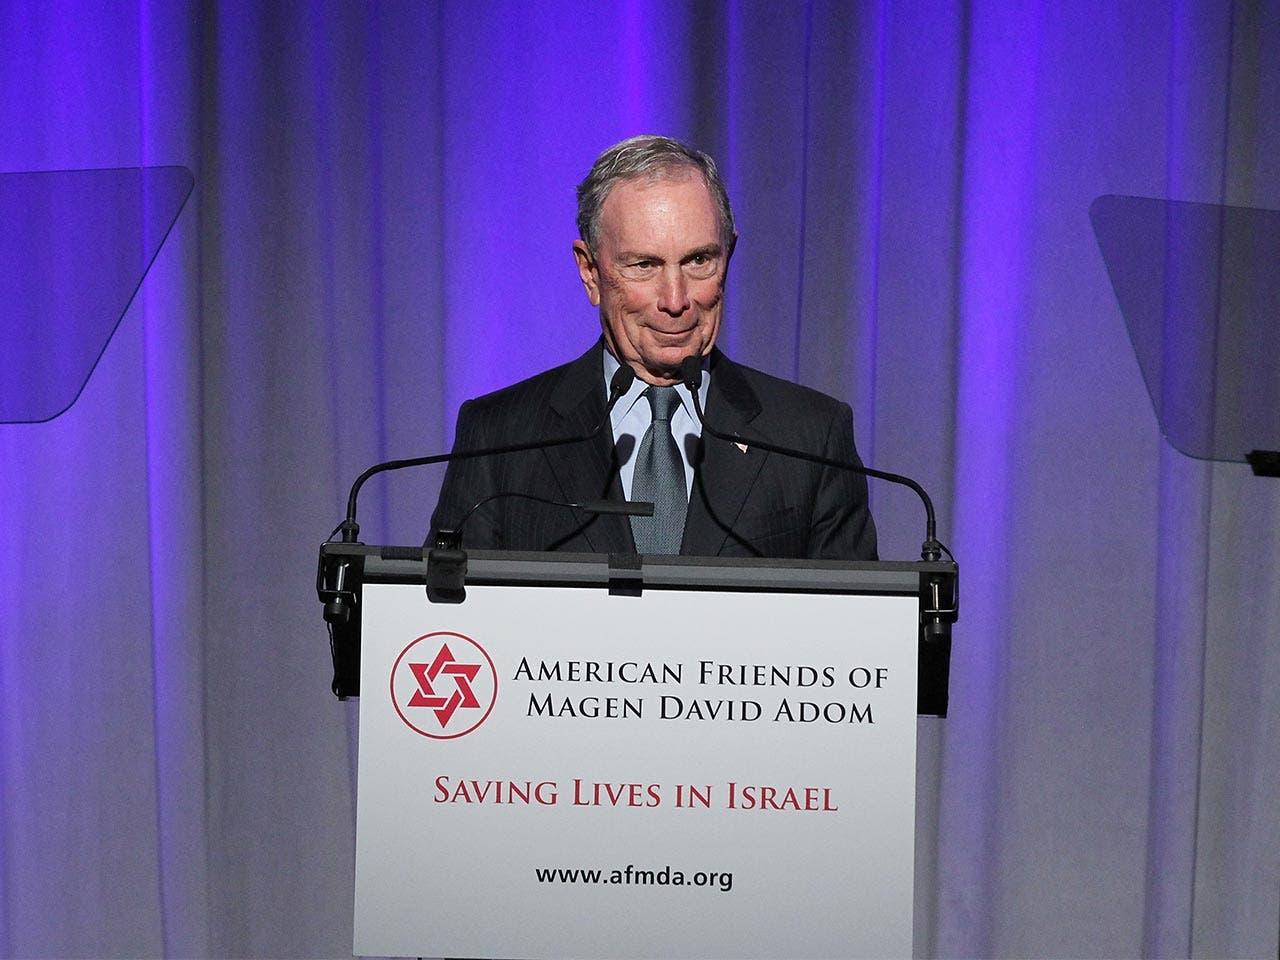 Michael Bloomberg | Bennett Raglin/Getty Images